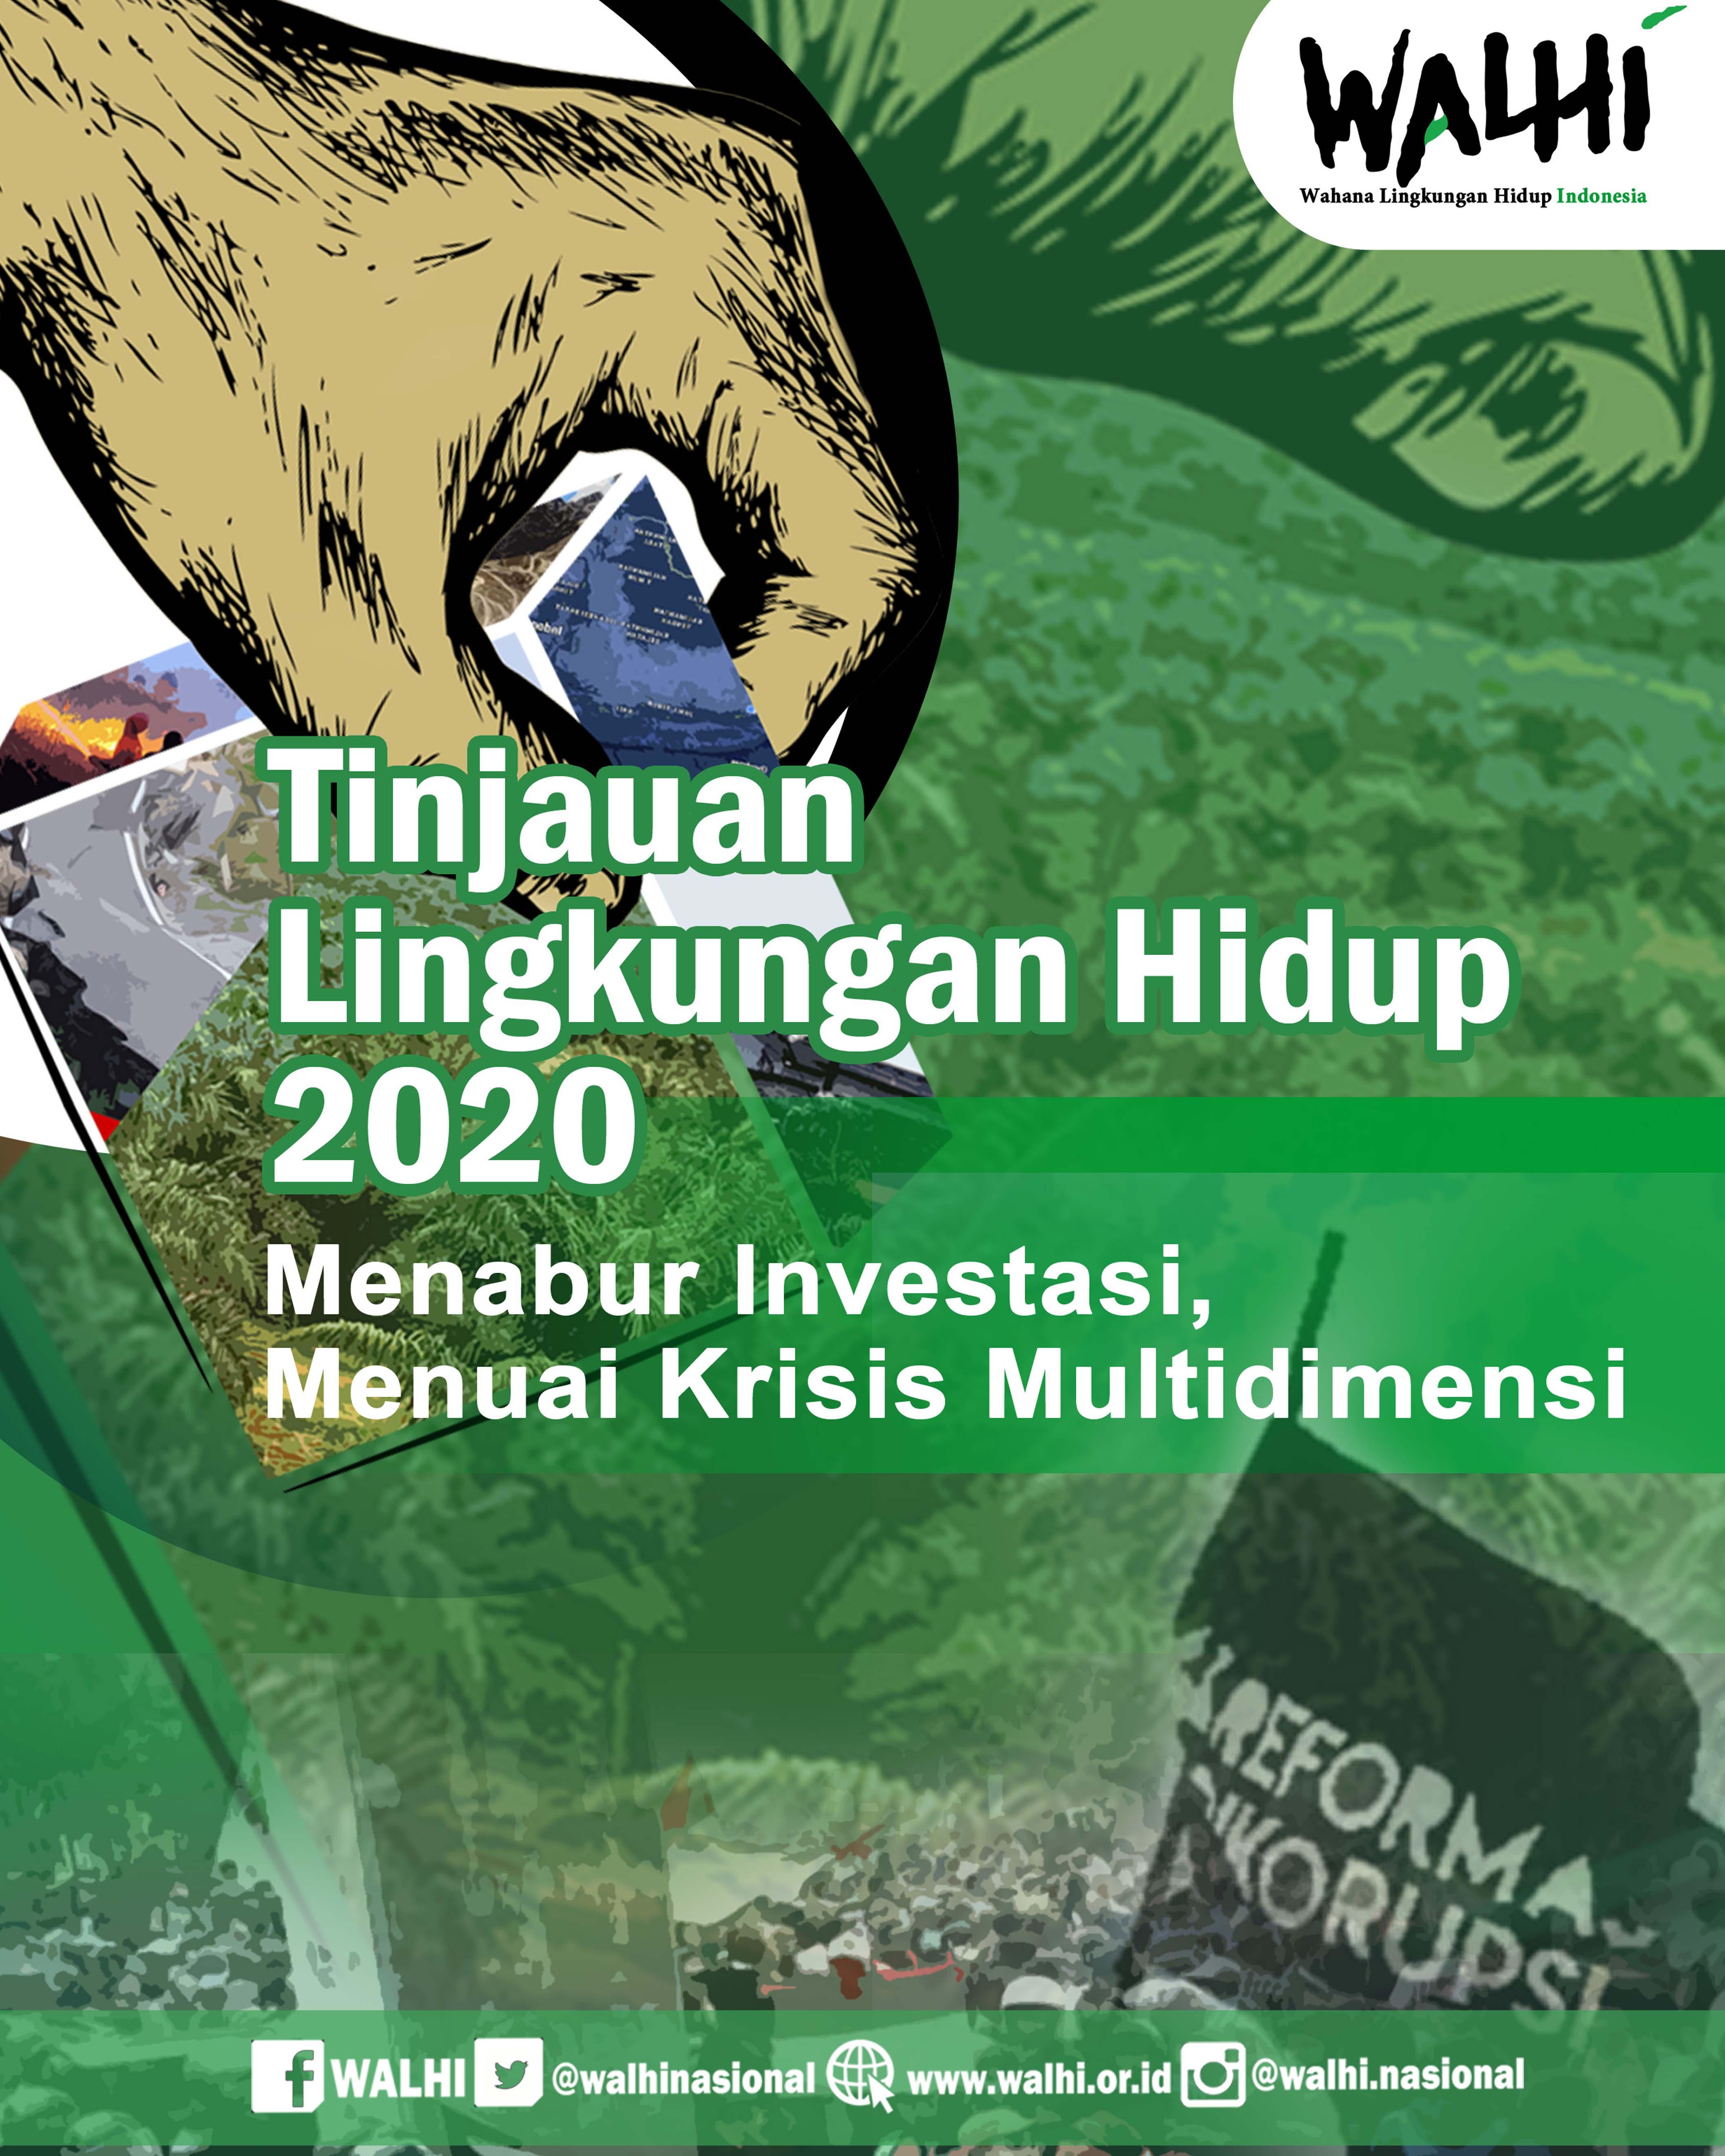 Pada Rabu, 29 Januari 2019, WALHI meluncurkan Tinjauan Lingkungan Hidup 2020 yang berjudul Menabur Investasi, Menuai Krisis Multidimensi. Laporan tahunan ini memberikan refleksi kondisi lingkungan hidup 2019 dan proyeksi kondisi lingkungan hidup pada 2020.